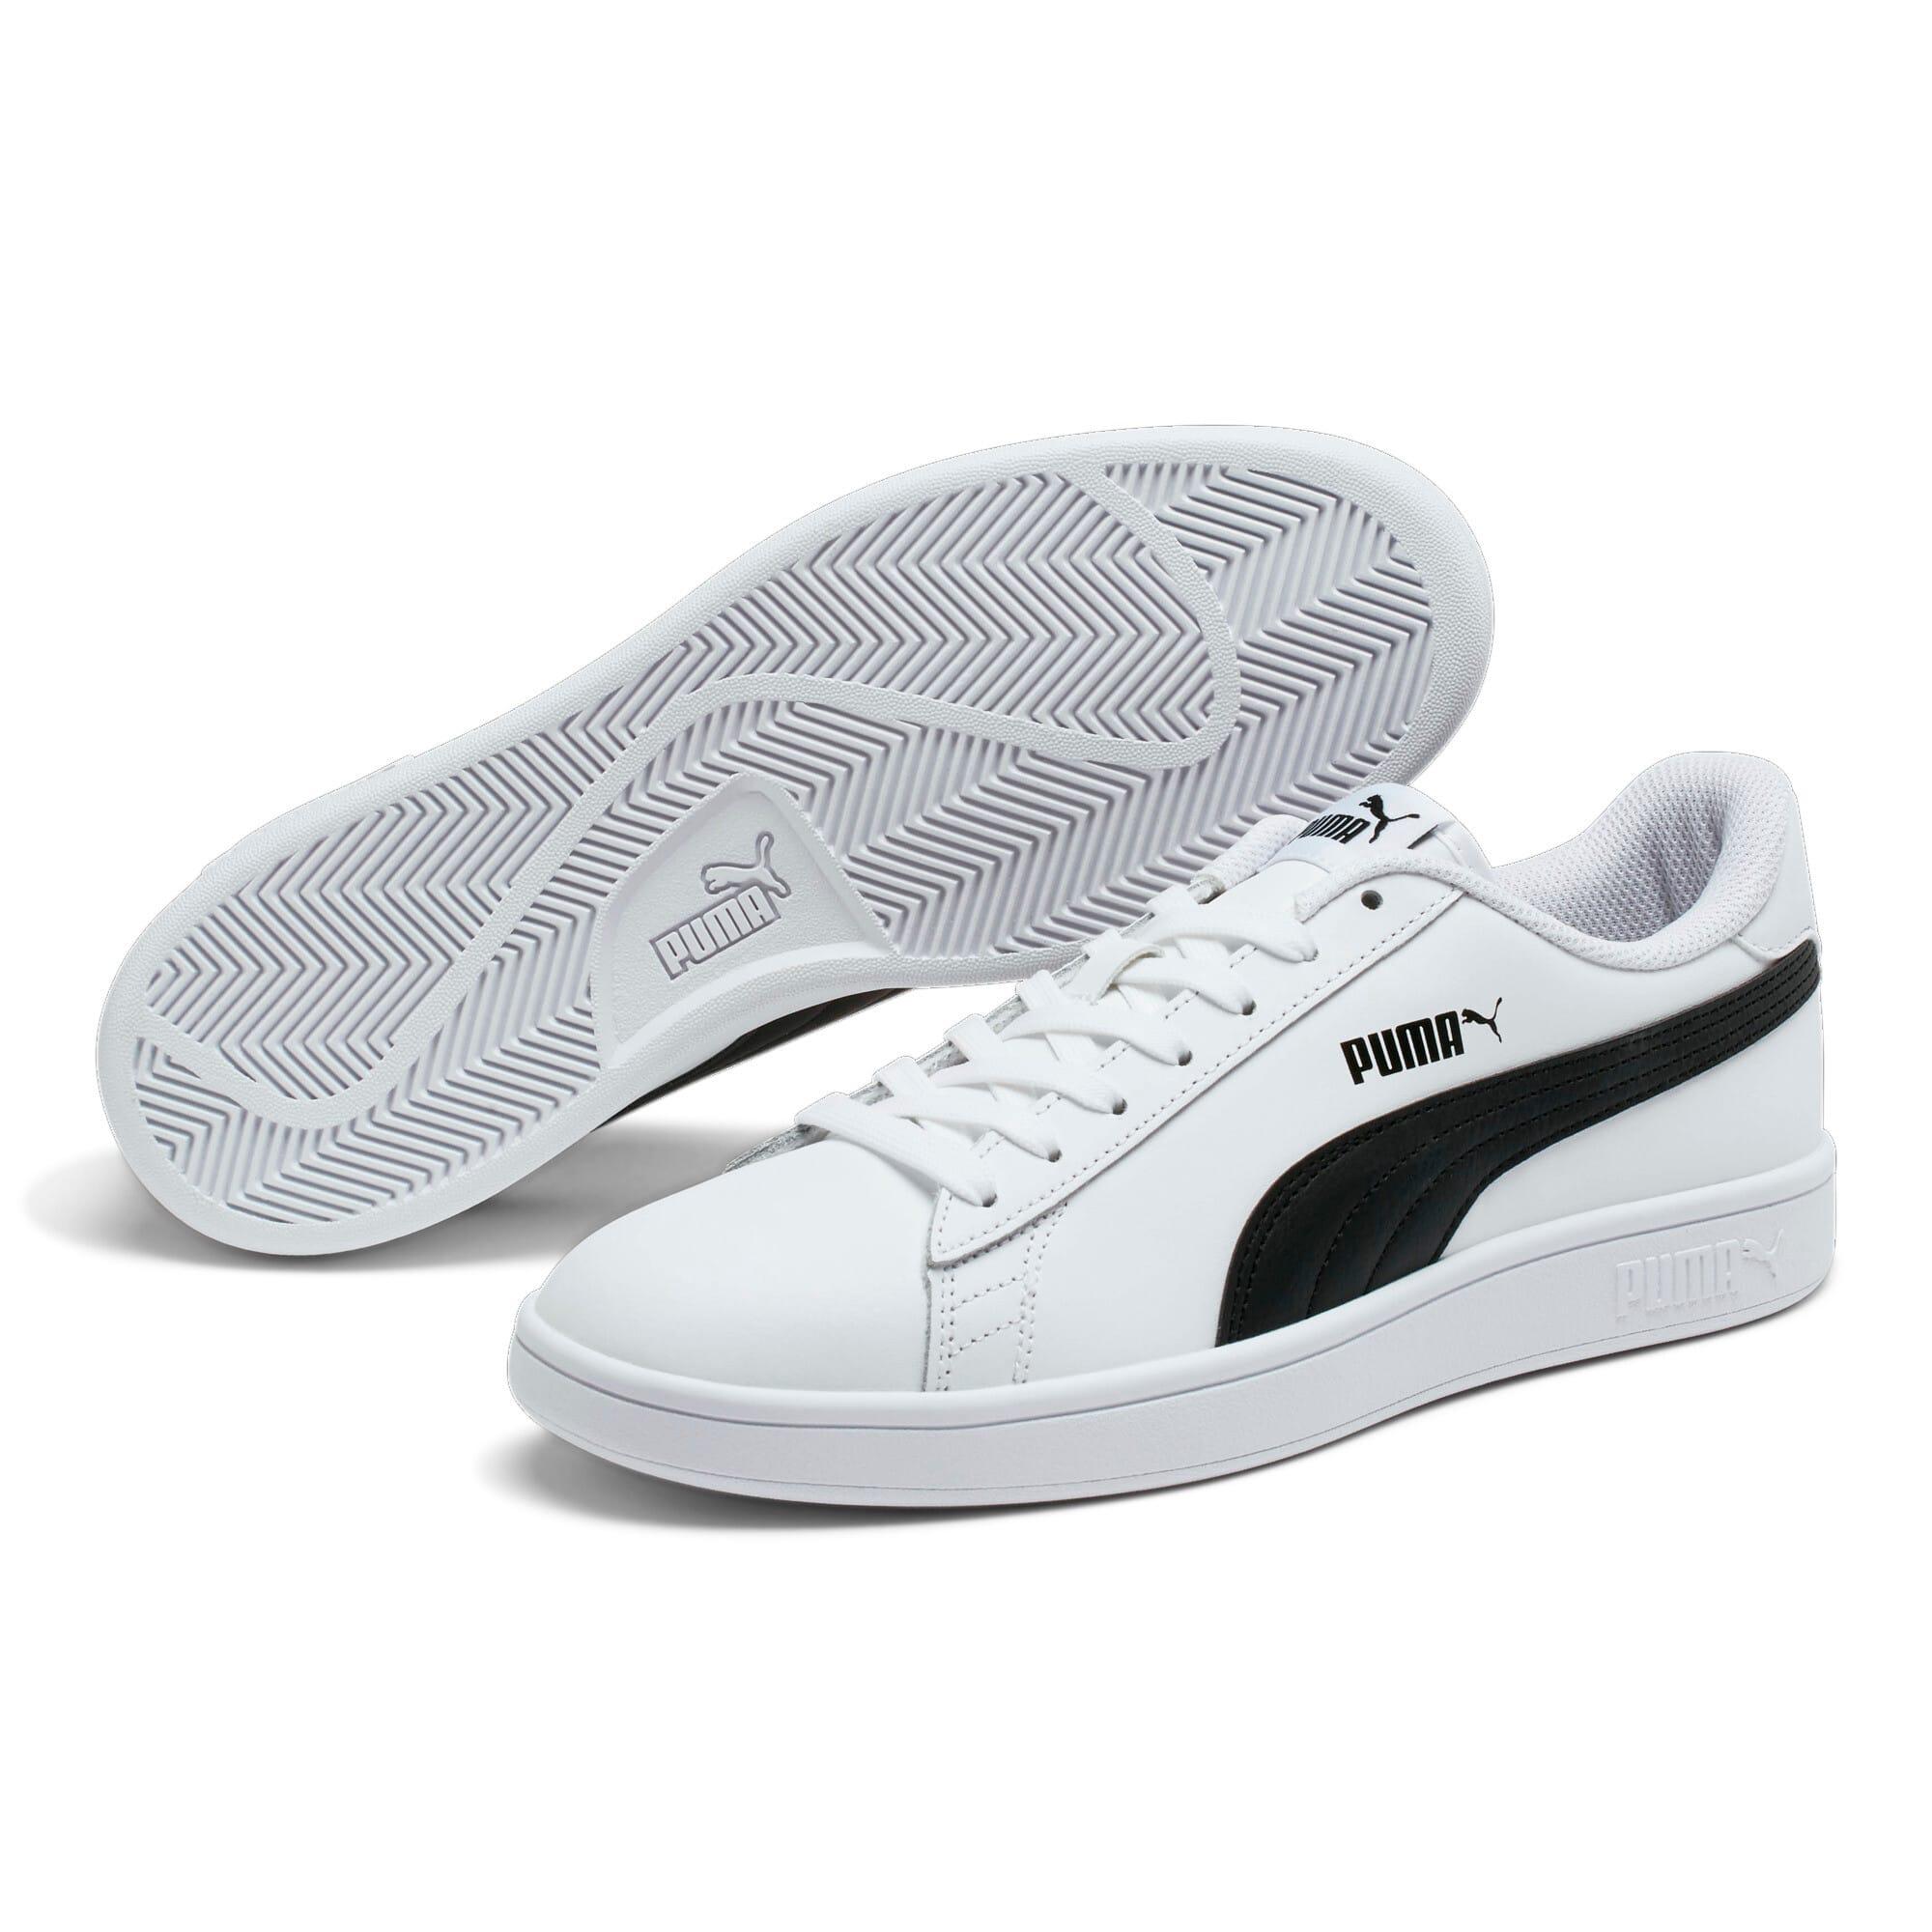 Thumbnail 2 of Smash v2 Leather Sneakers, Puma White-Puma Black, medium